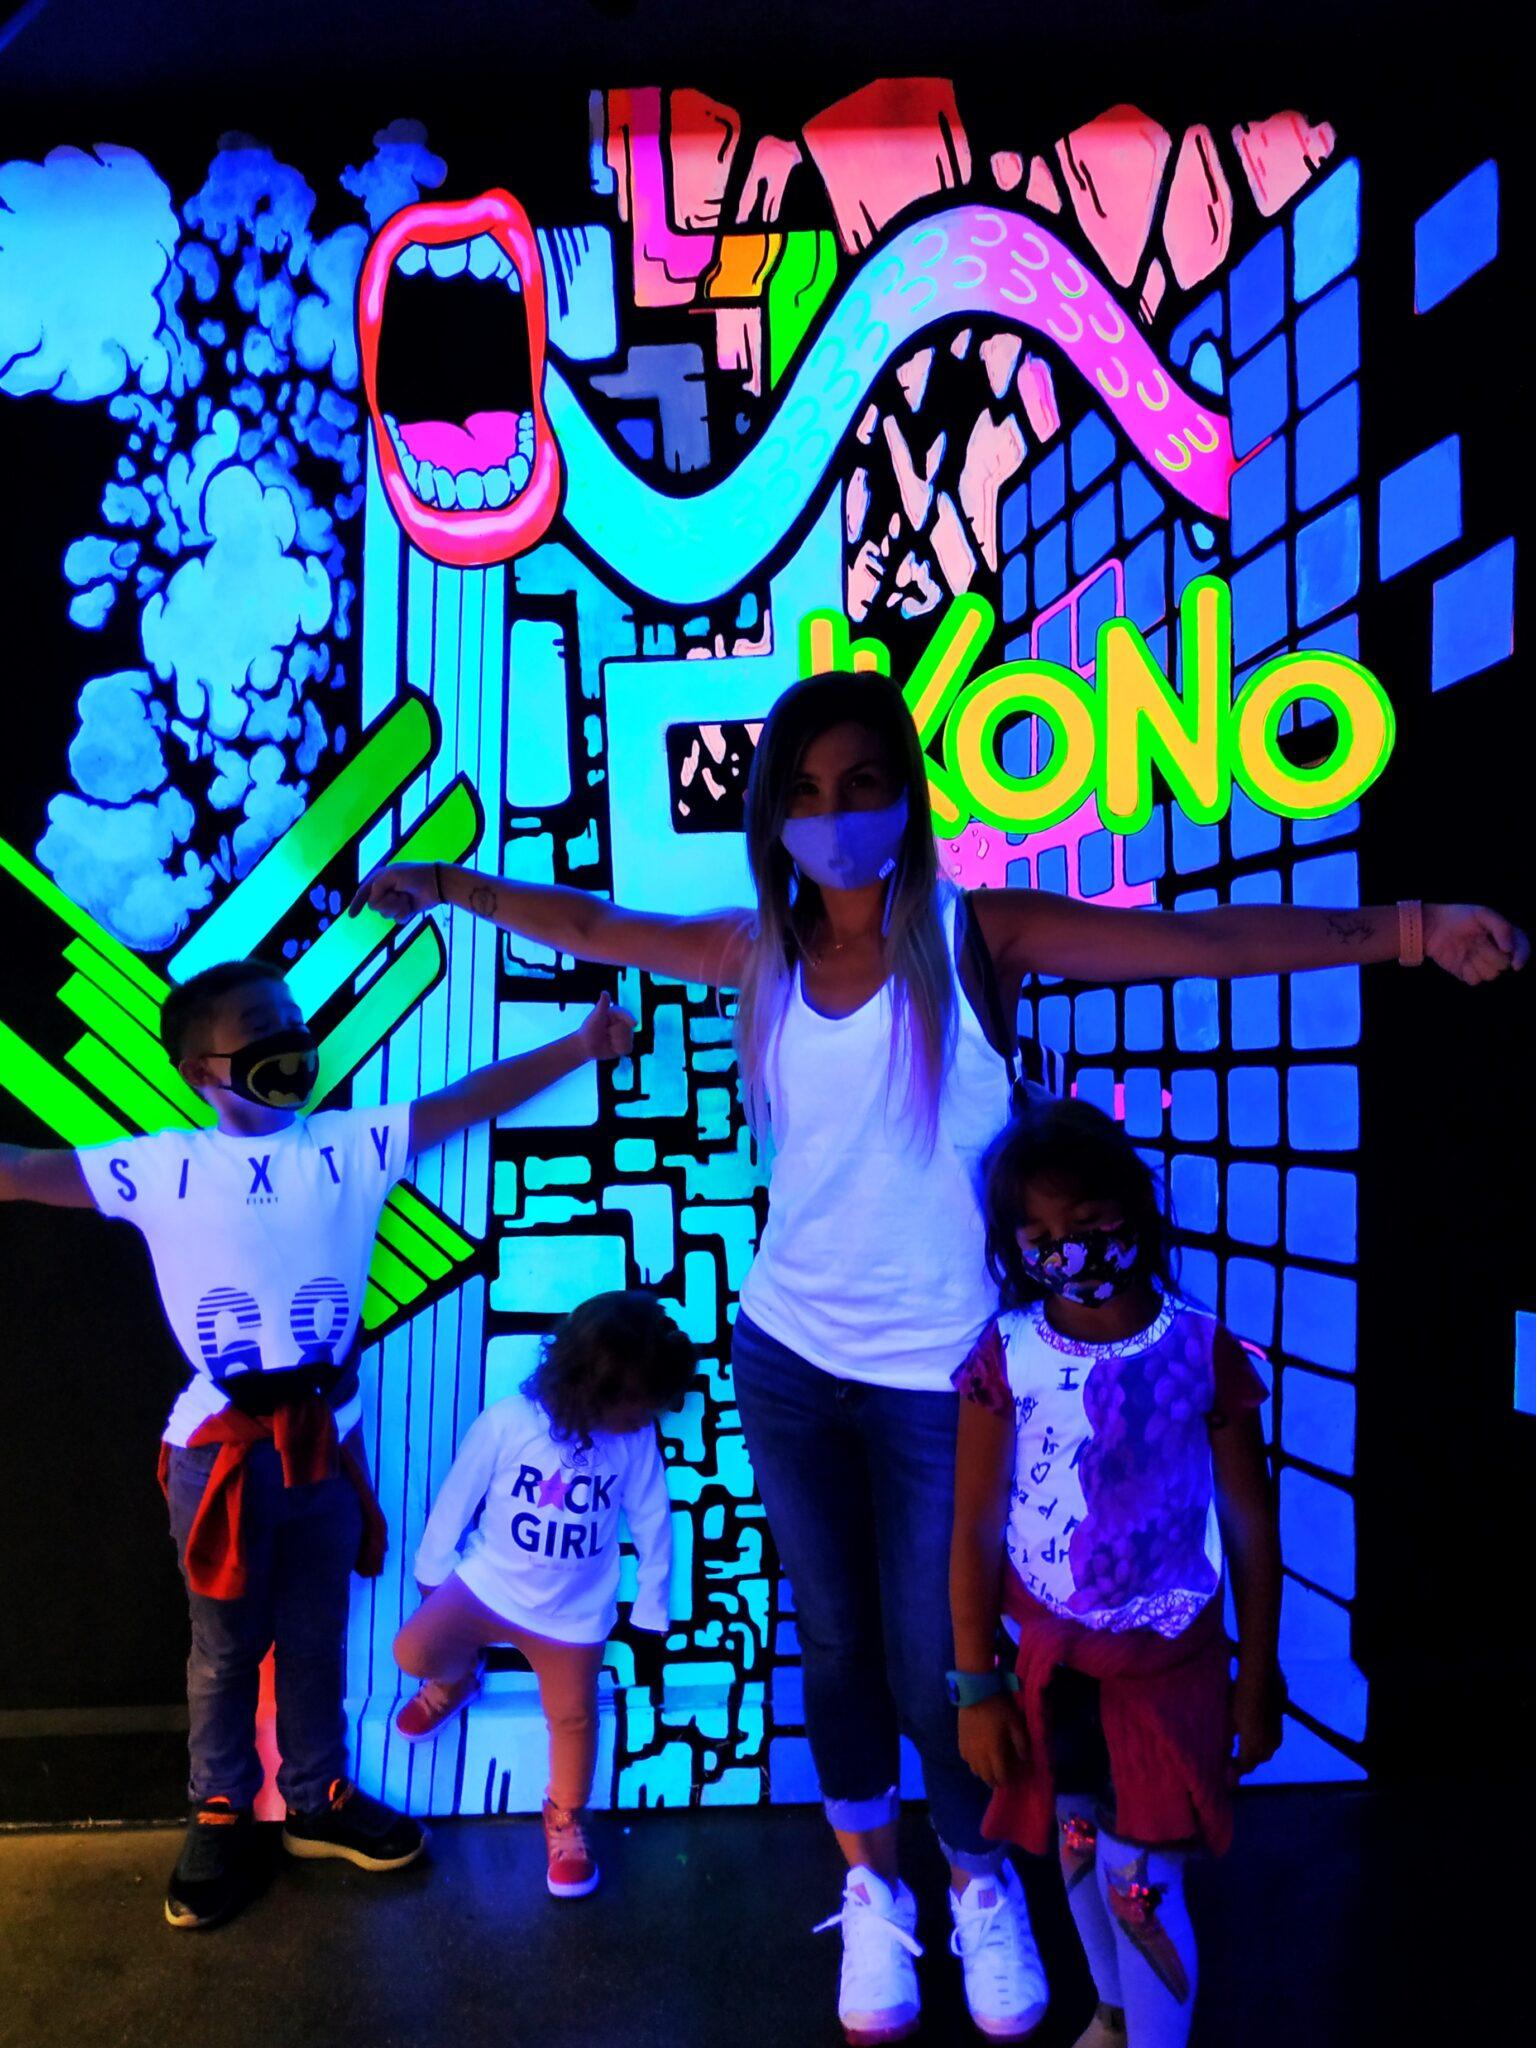 IMG 20200926 164937 01 scaled - Visitar IKONO Madrid con niños